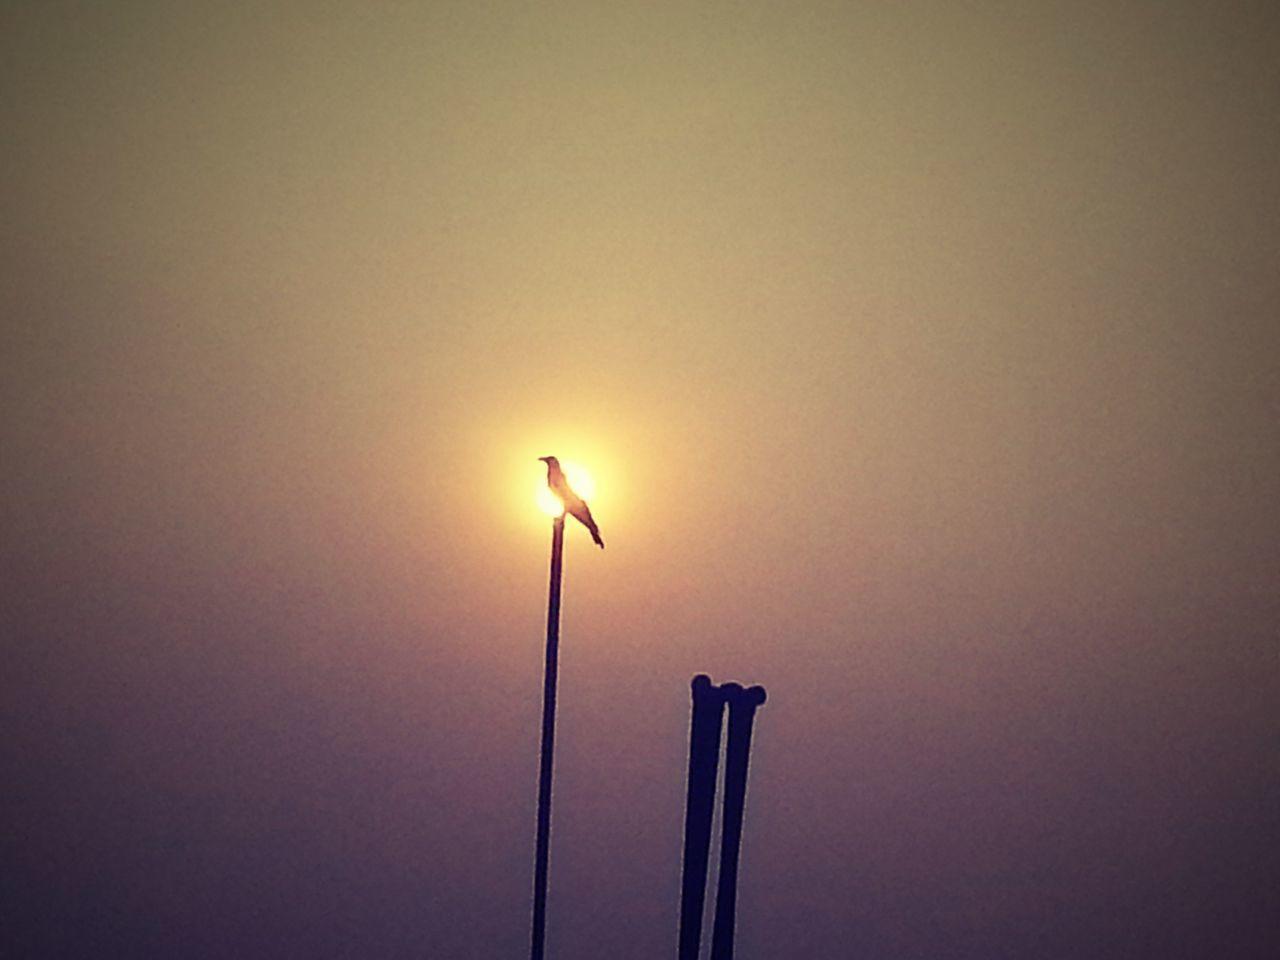 The bird is on fire Hunger Games Bird Myna Dusky Sky Sunset Evening Sky